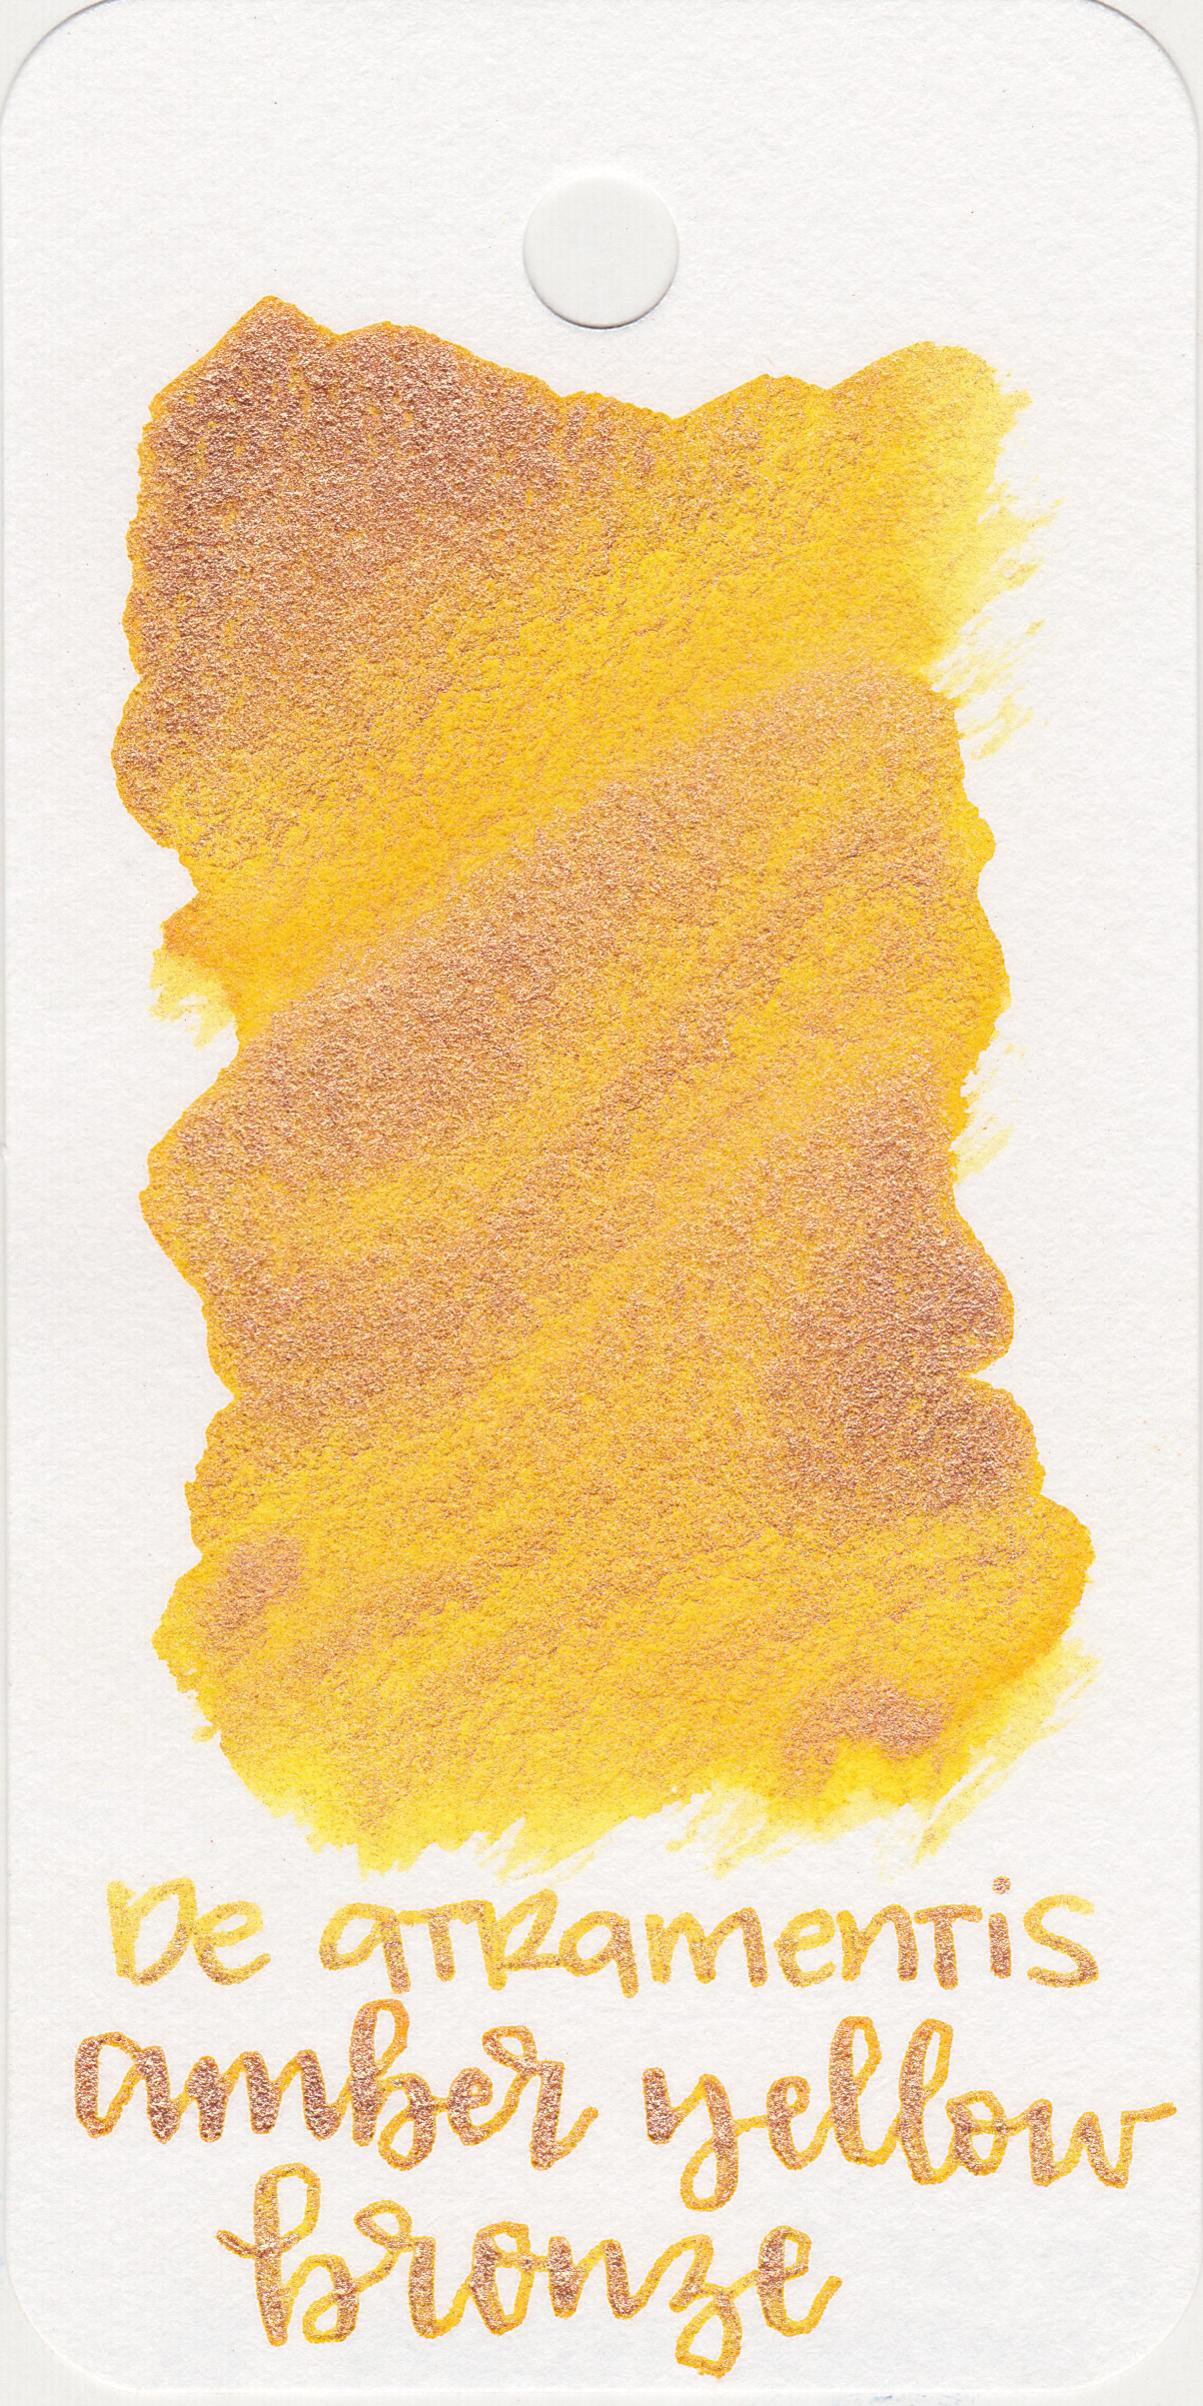 da-amber-yellow-4.jpg